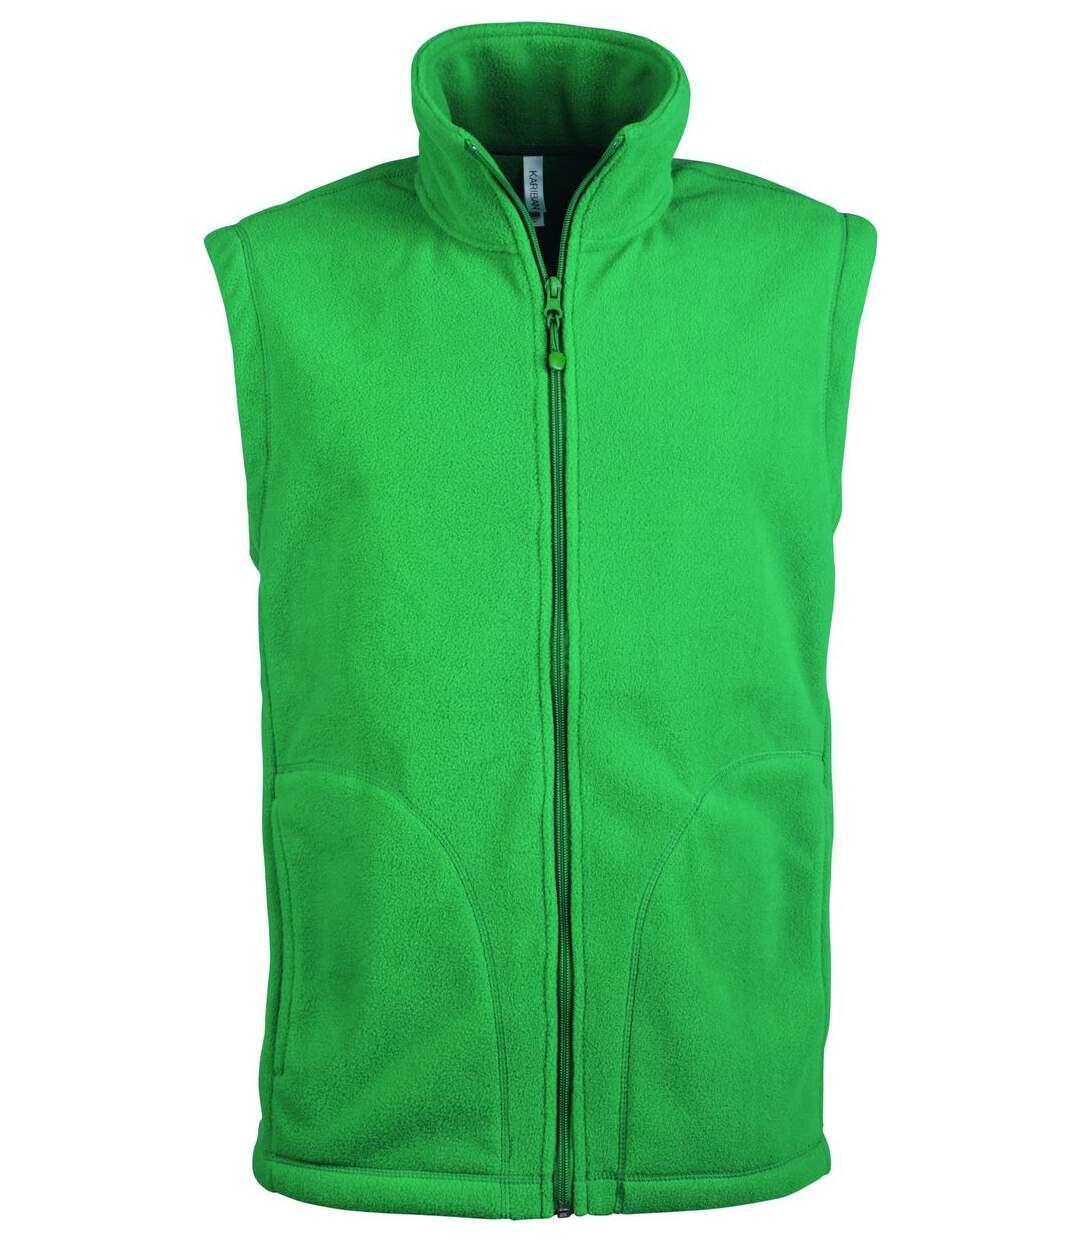 Gilet sans manches micro polaire homme - K913 - vert kelly